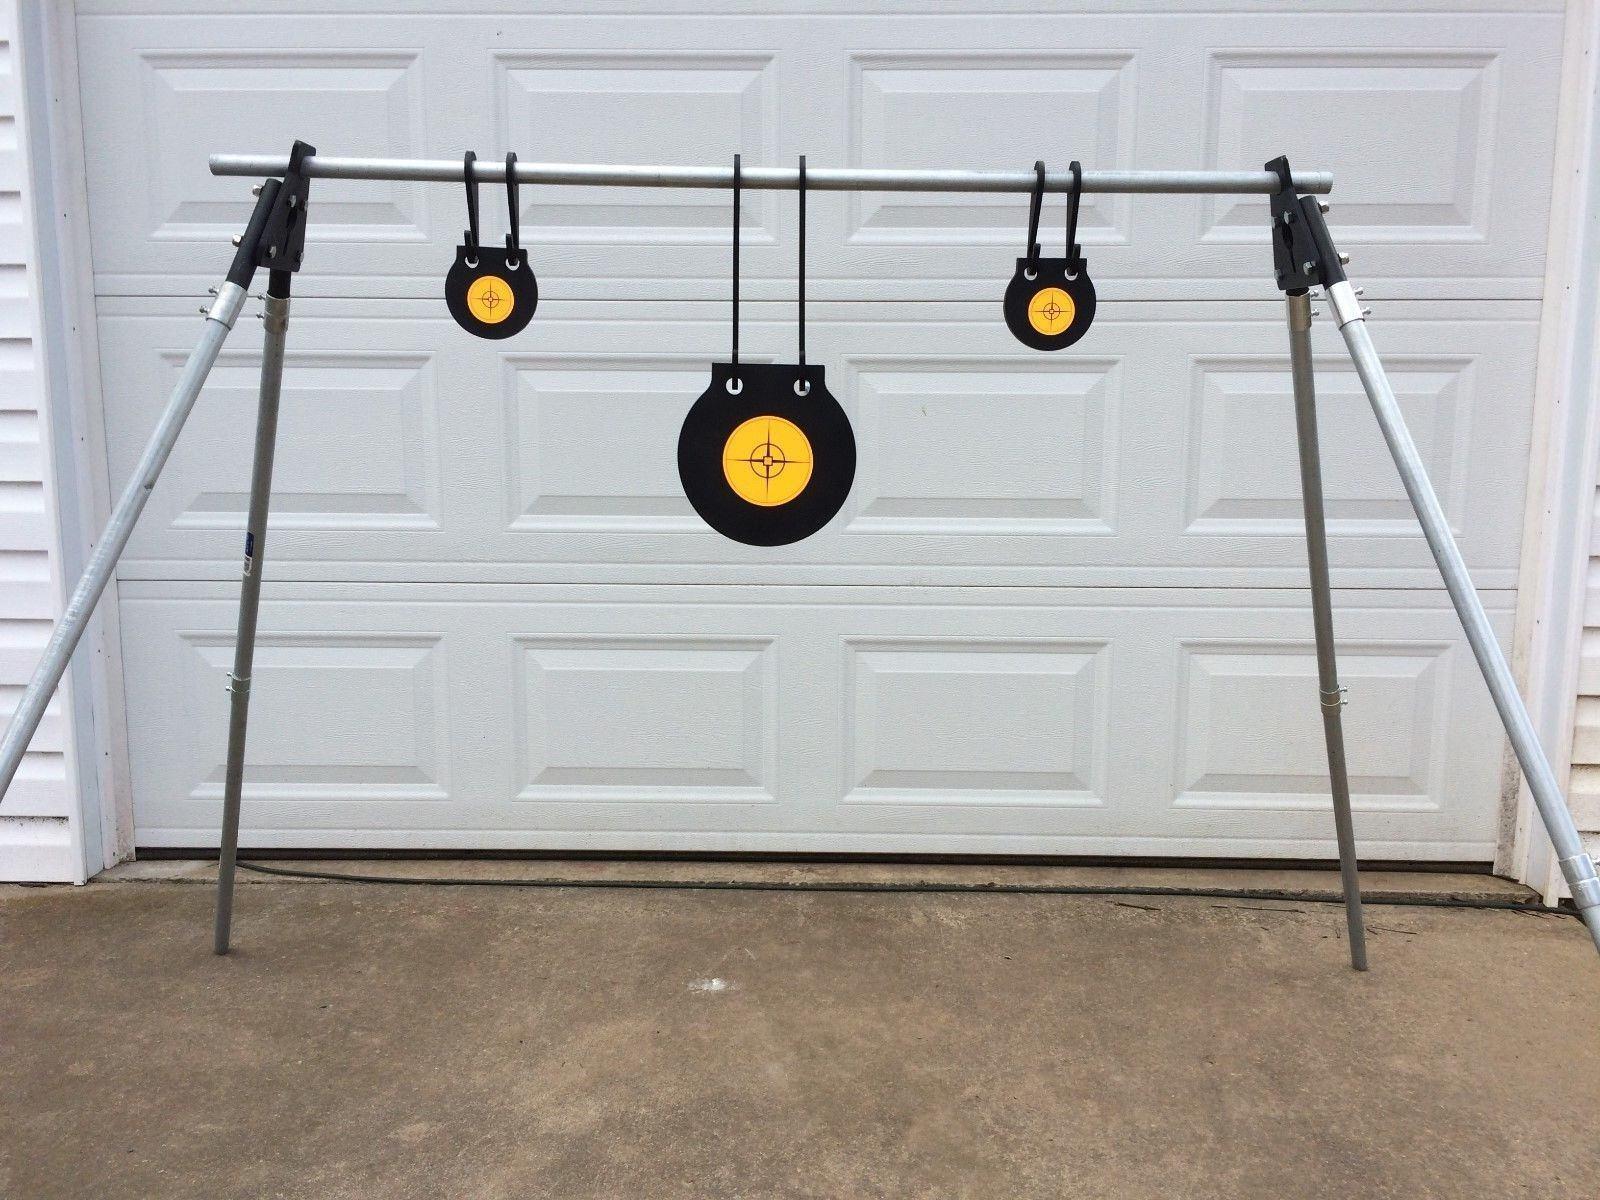 AR500 Acier Shooting Target Kit-Support Parenthèses, (1) 8  (2) 4  Gongs, (6) Crochets